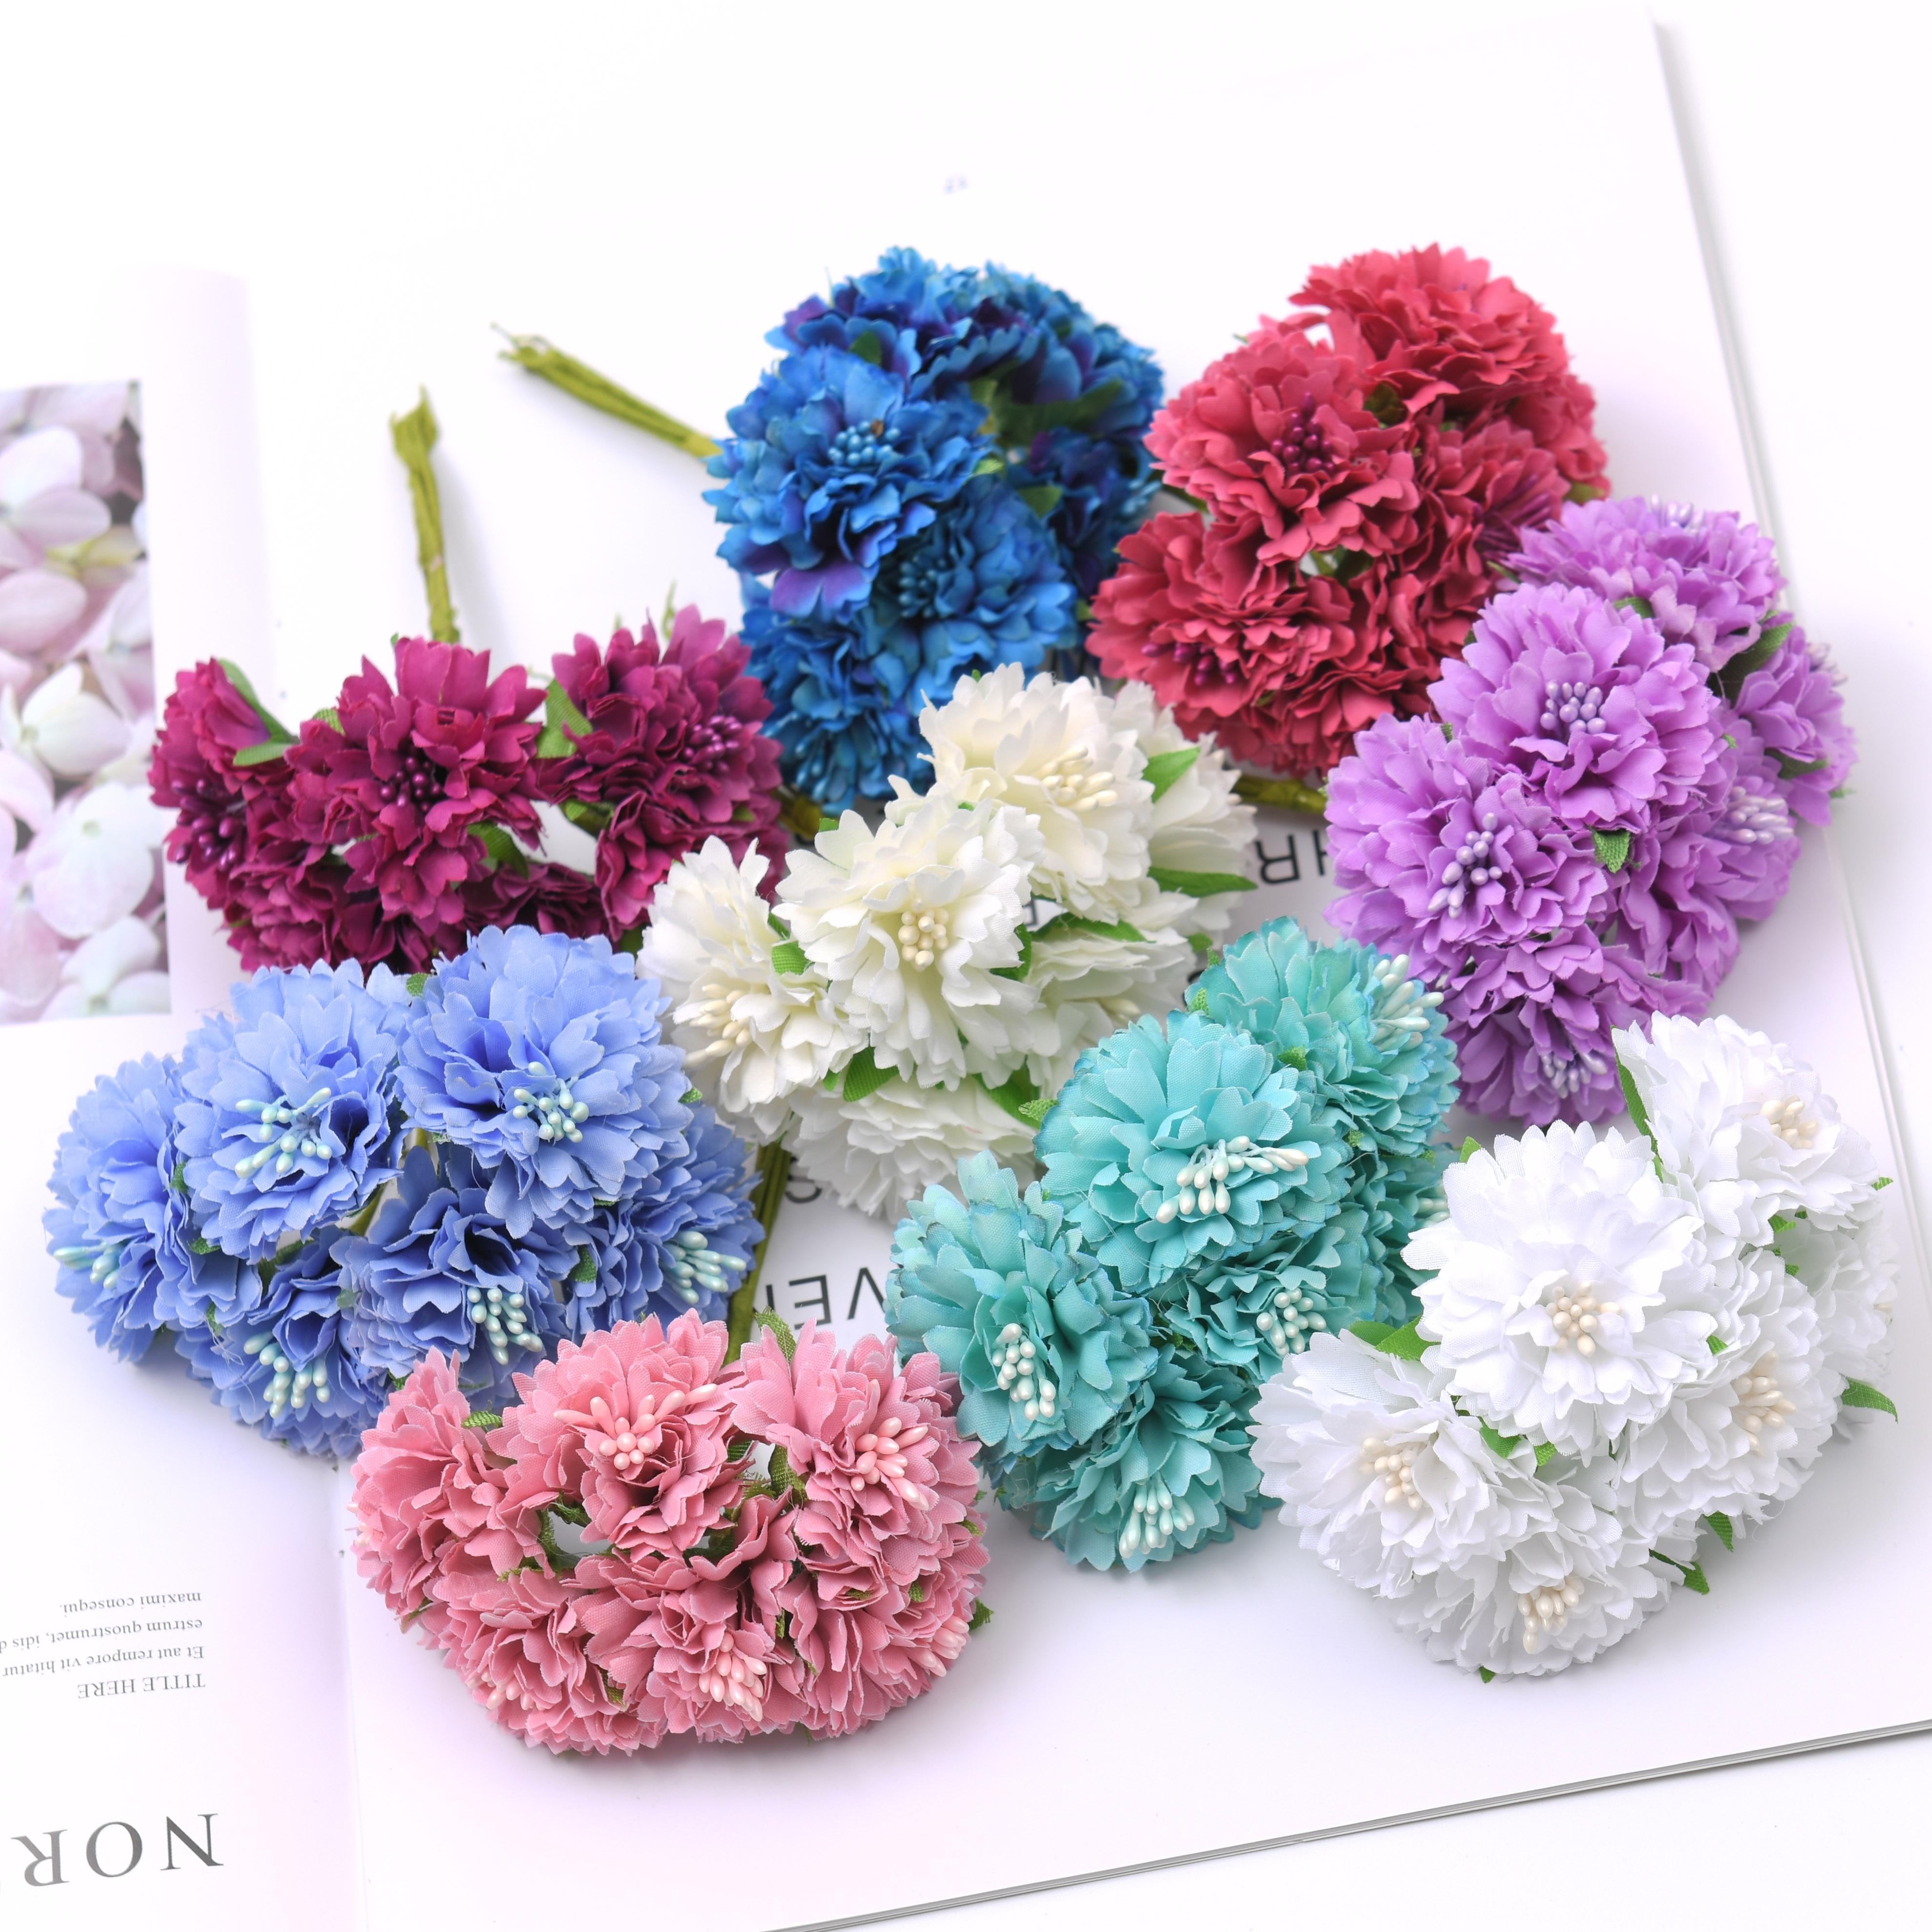 6pcs/Lot mini Carnation Bouquet Silk Artificial Flowers DIY Handmade Wreath Scrapbook Wedding Decoration Craft Fake Flower